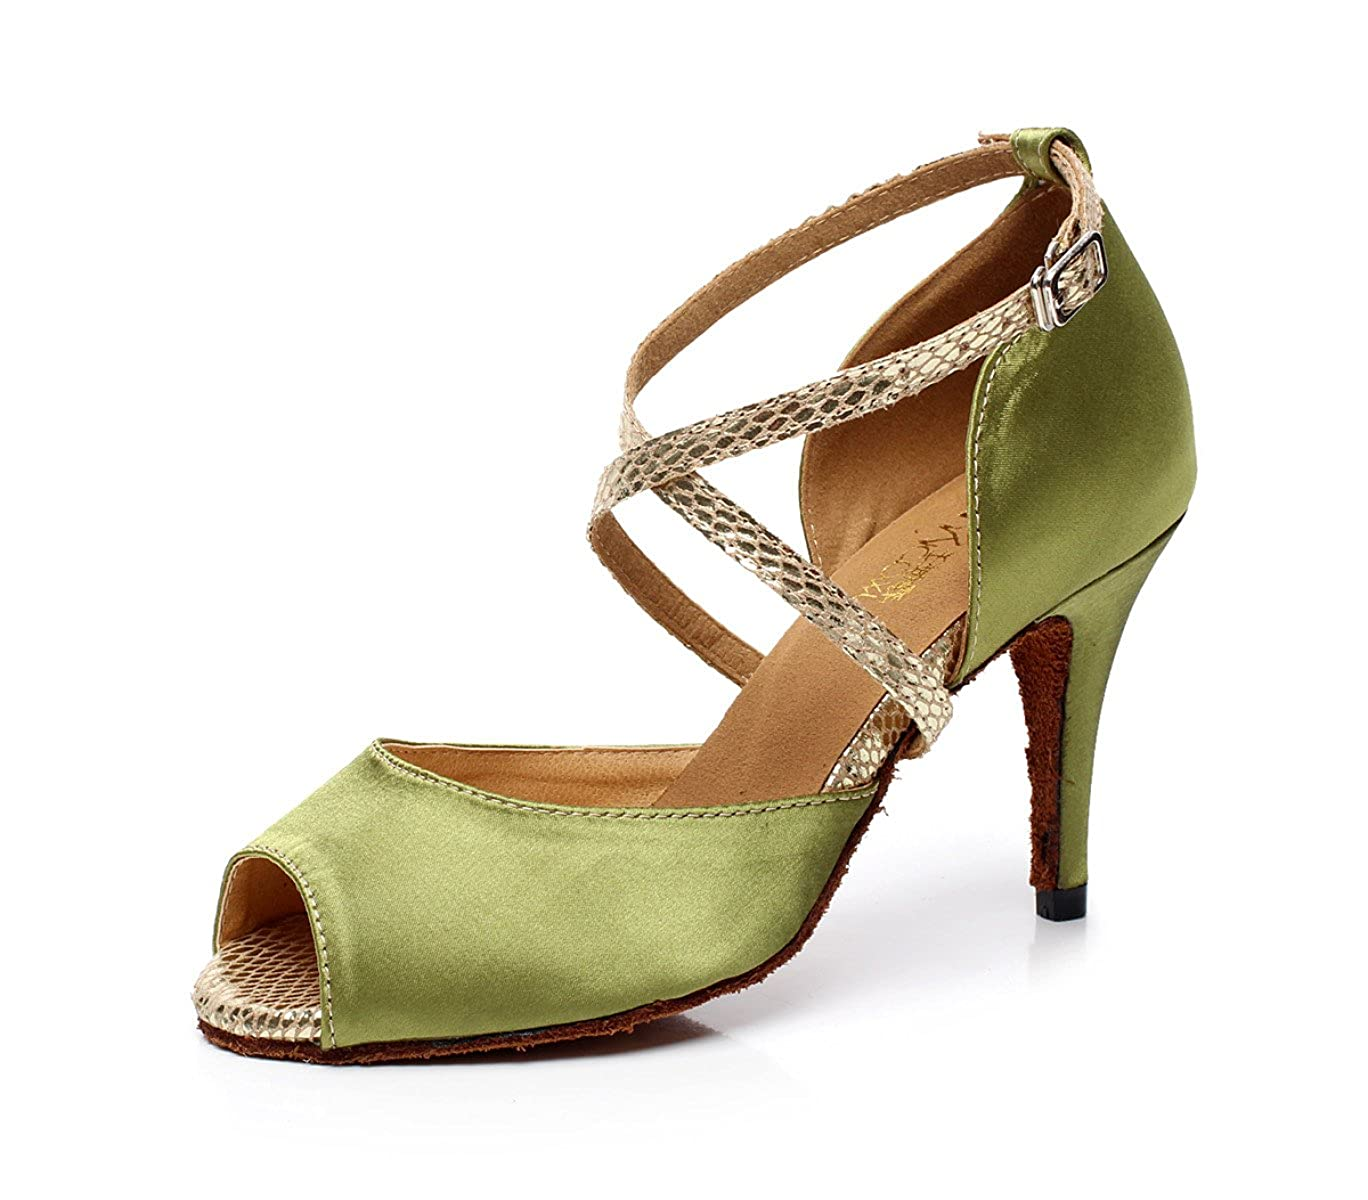 JSHOE Cristaux De Femmes étincelant Satin 19744 Femmes Latin Salsa Chaussures Sandales De Danse Tango/Thé/Samba/Moderne/Jazz Chaussures Sandales Talons Hauts,Green-heeled6cm-UK7/EU41/Our42 - c5adddc - fast-weightloss-diet.space